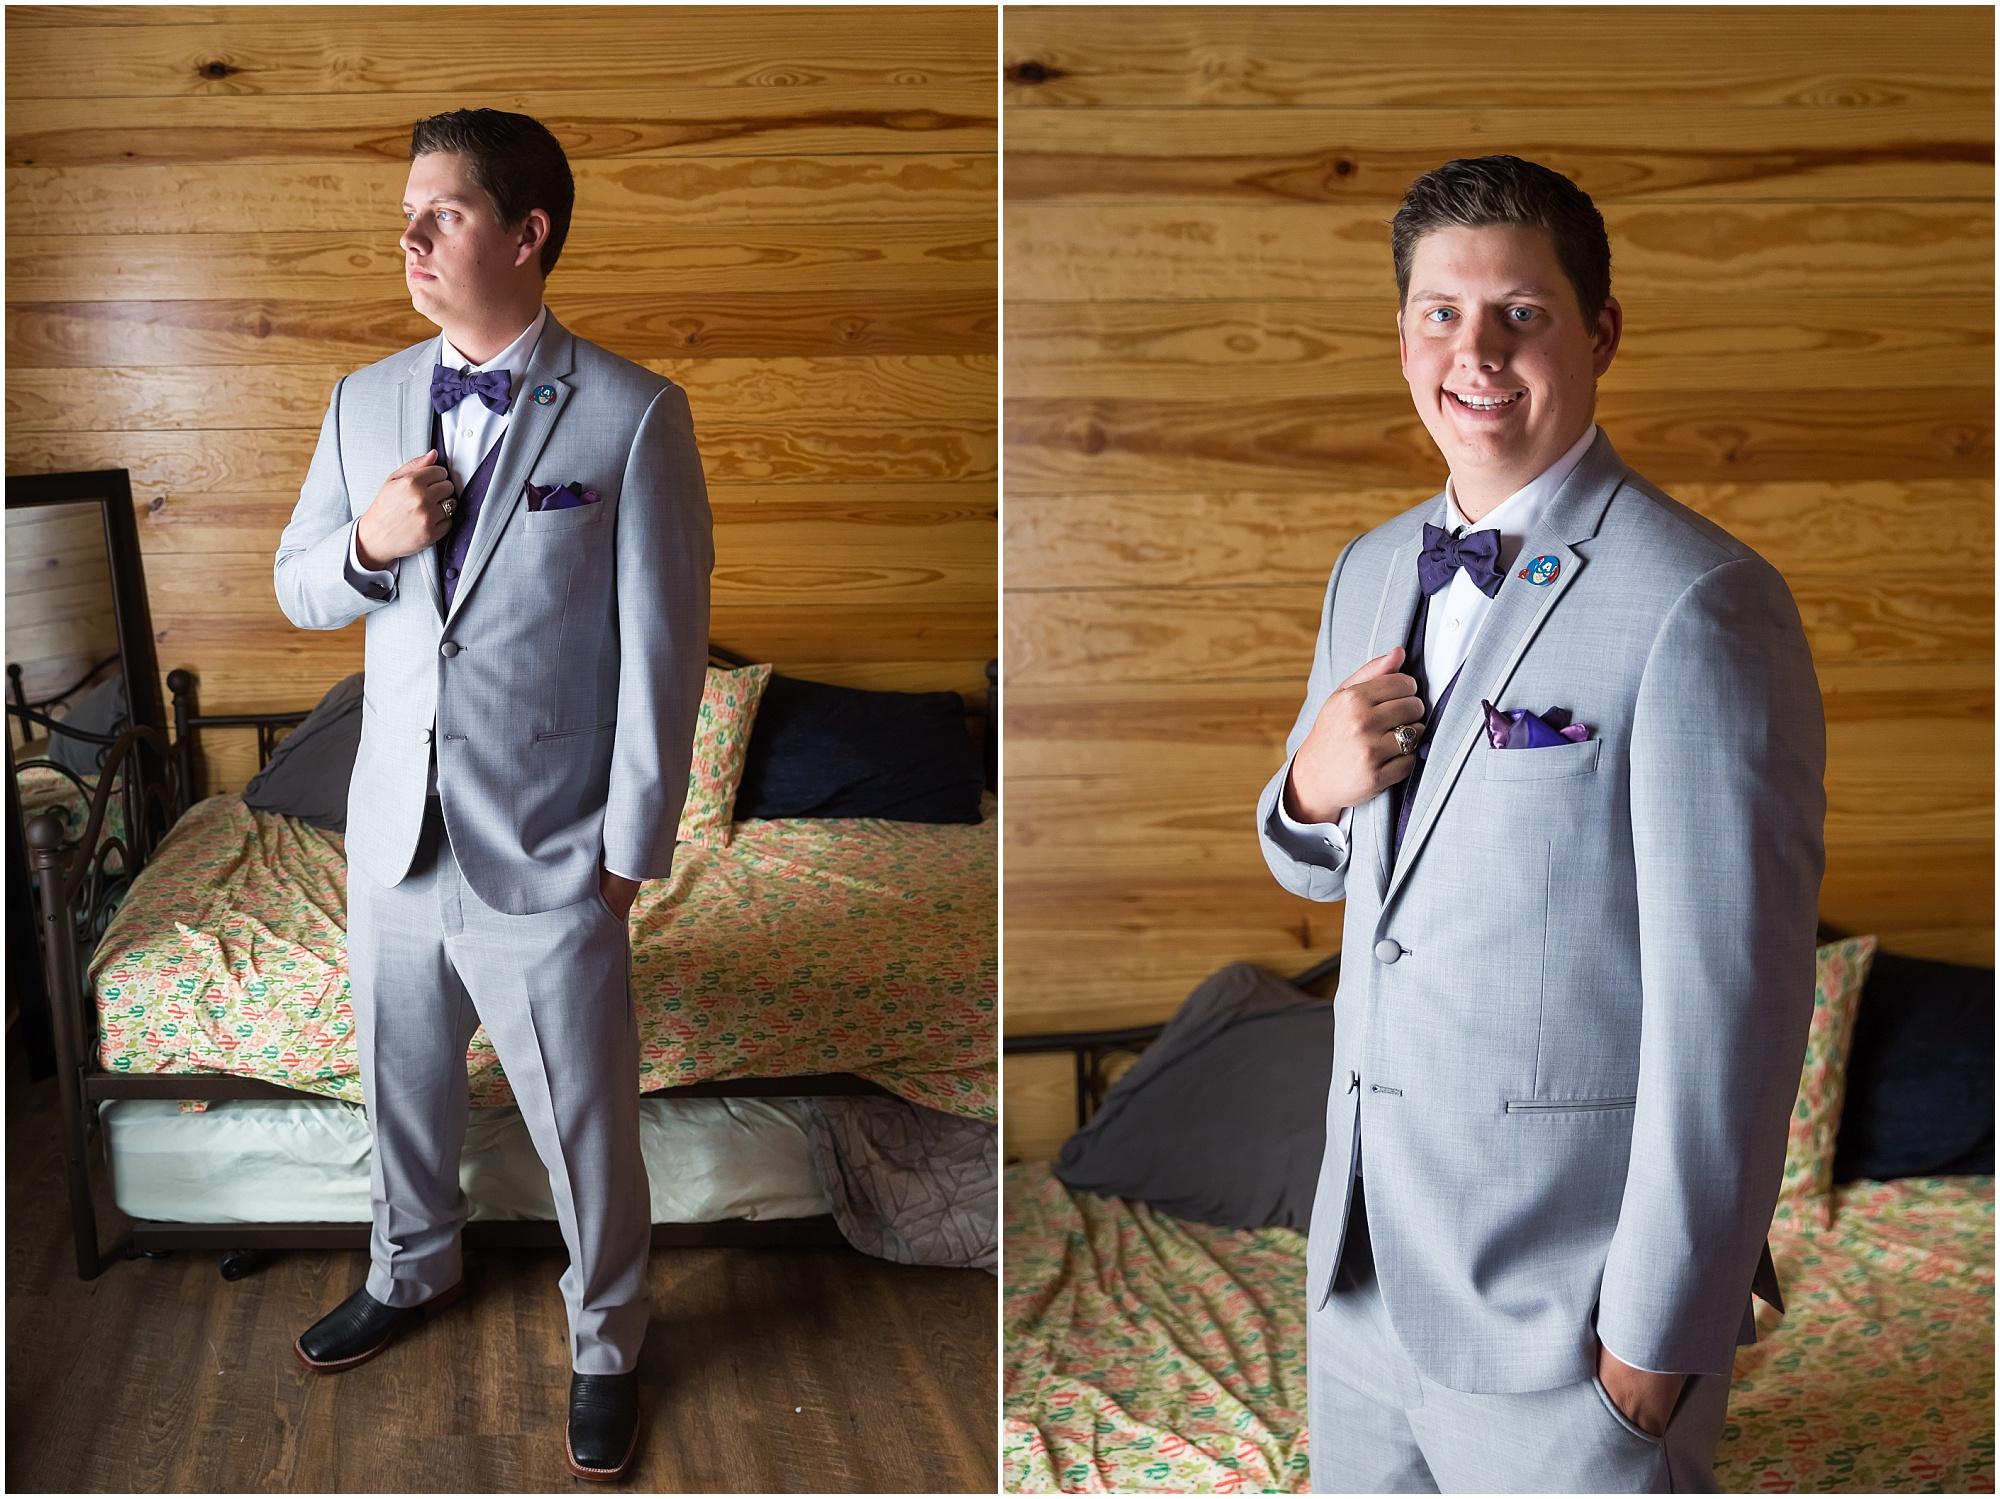 Disney-Inspired-Wedding-Central-Texas_0020.jpg